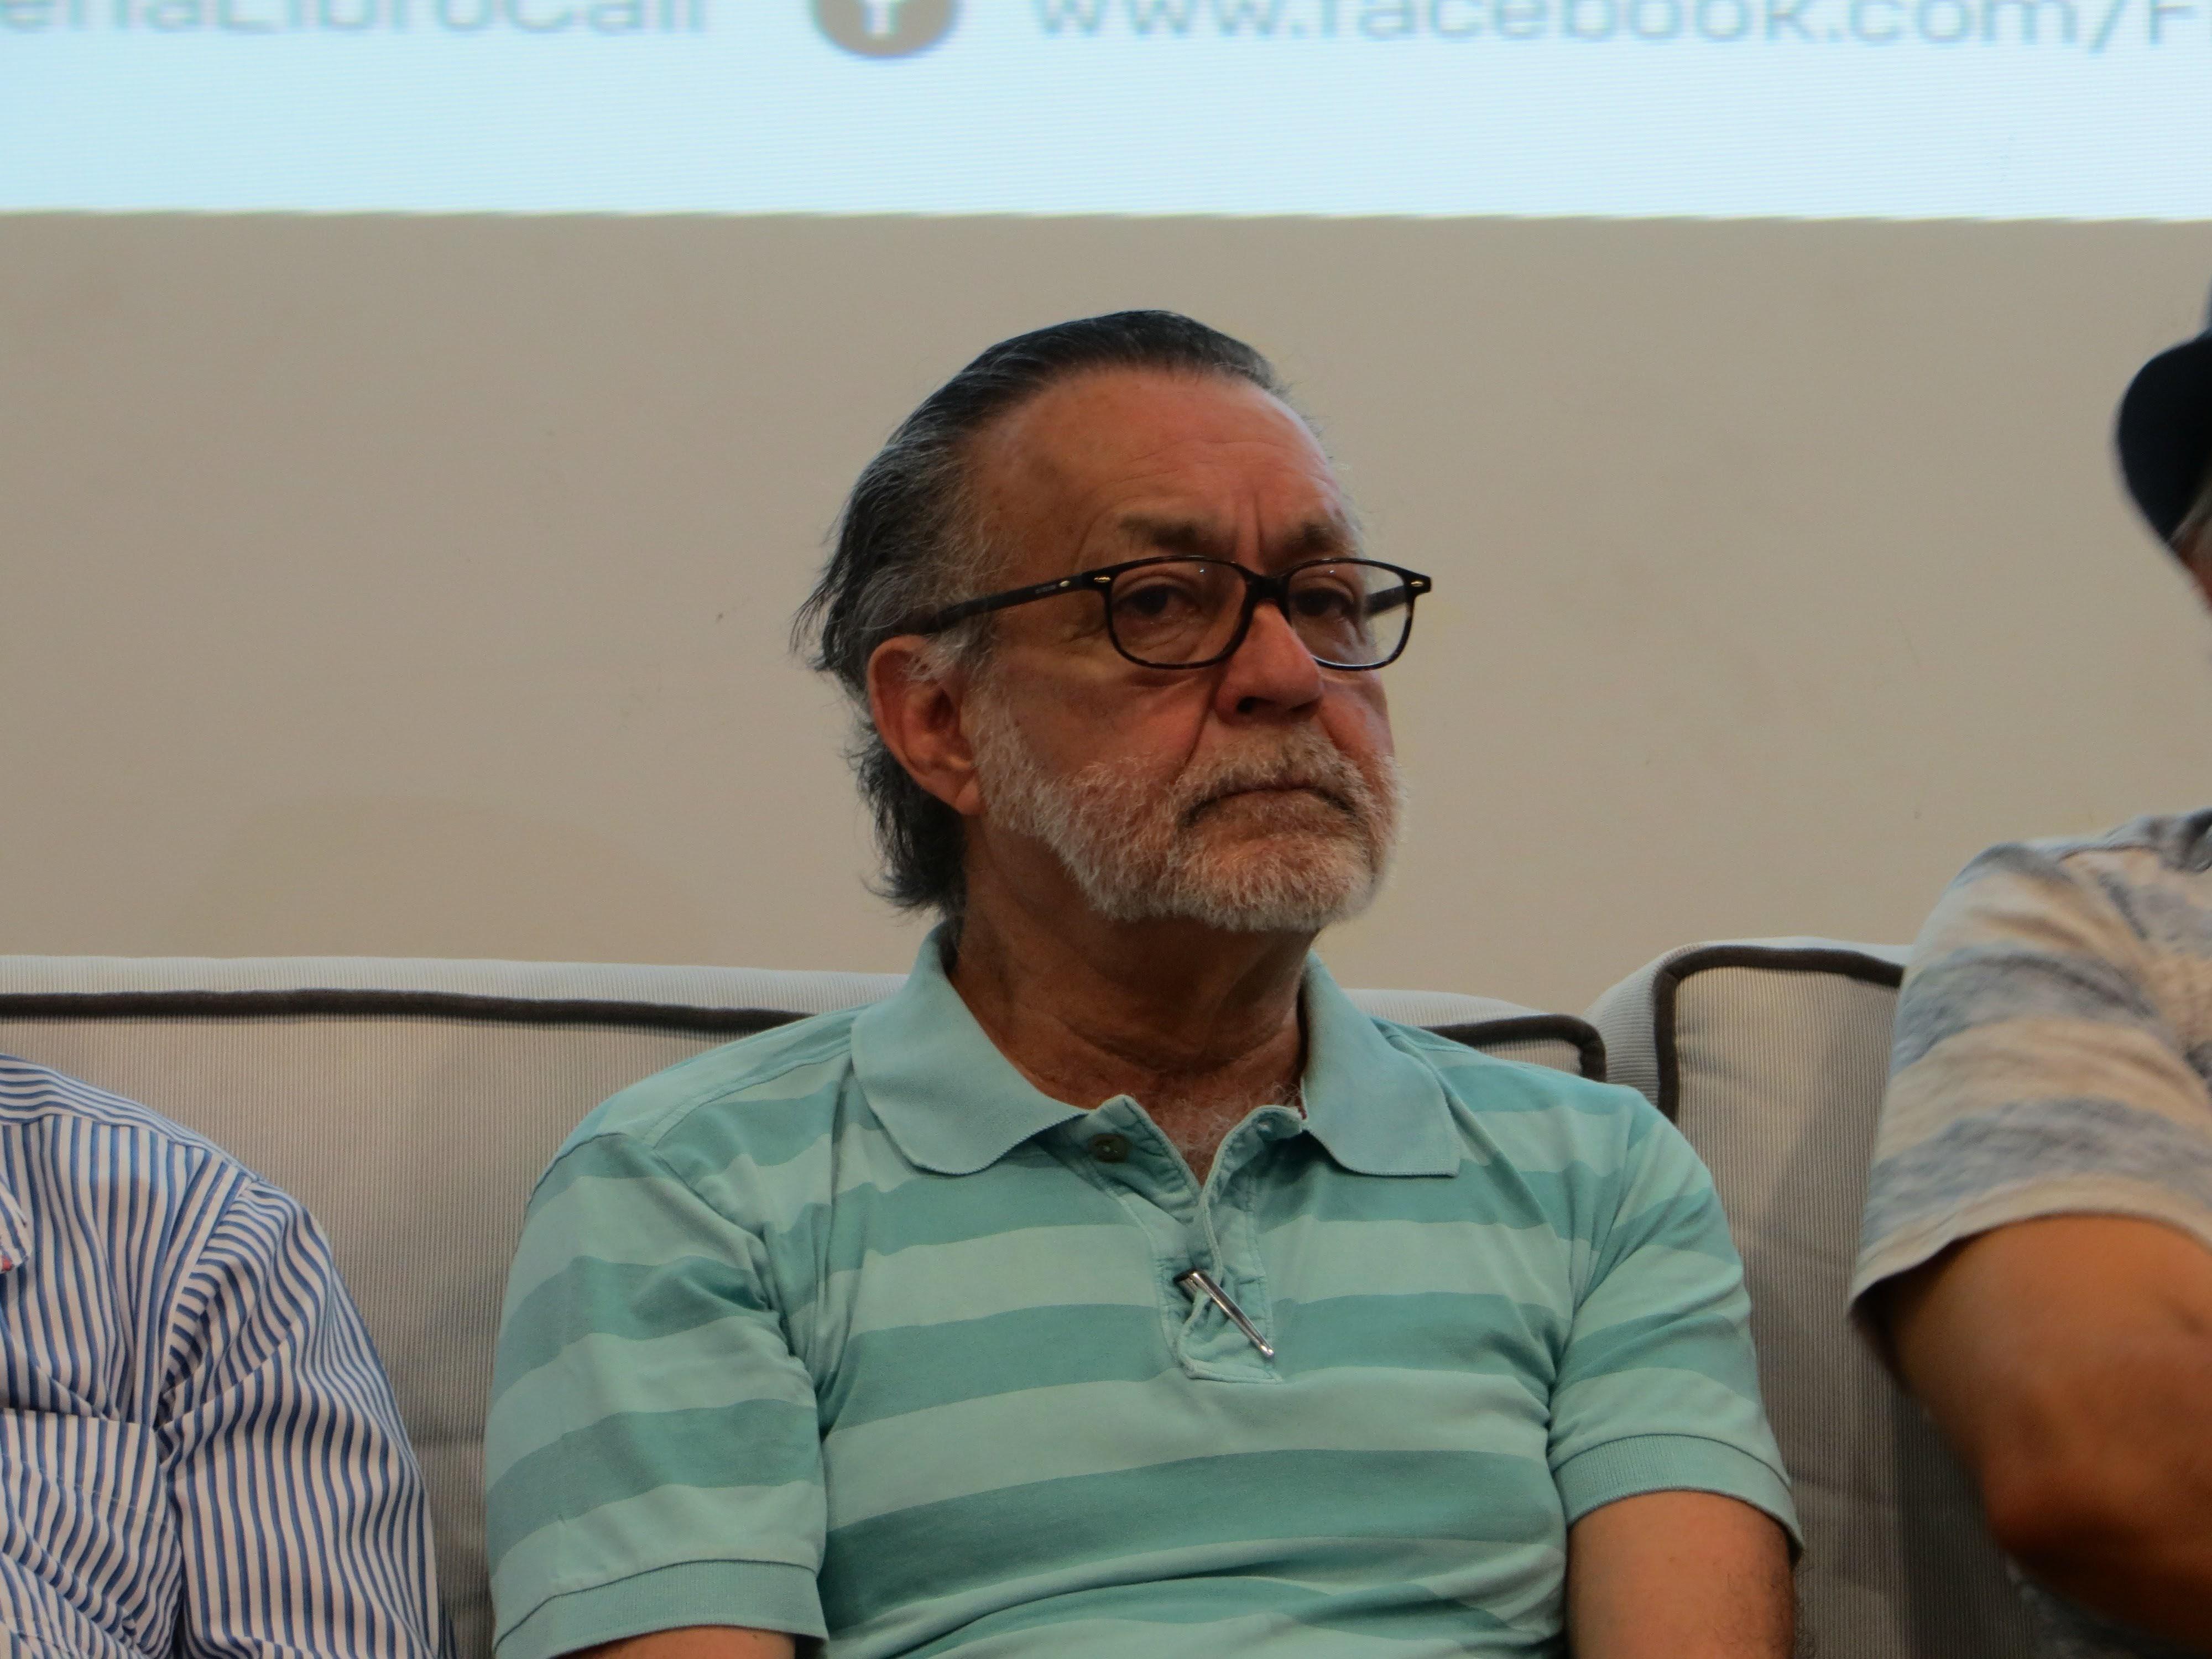 Photo: Jotamario Arbeláez